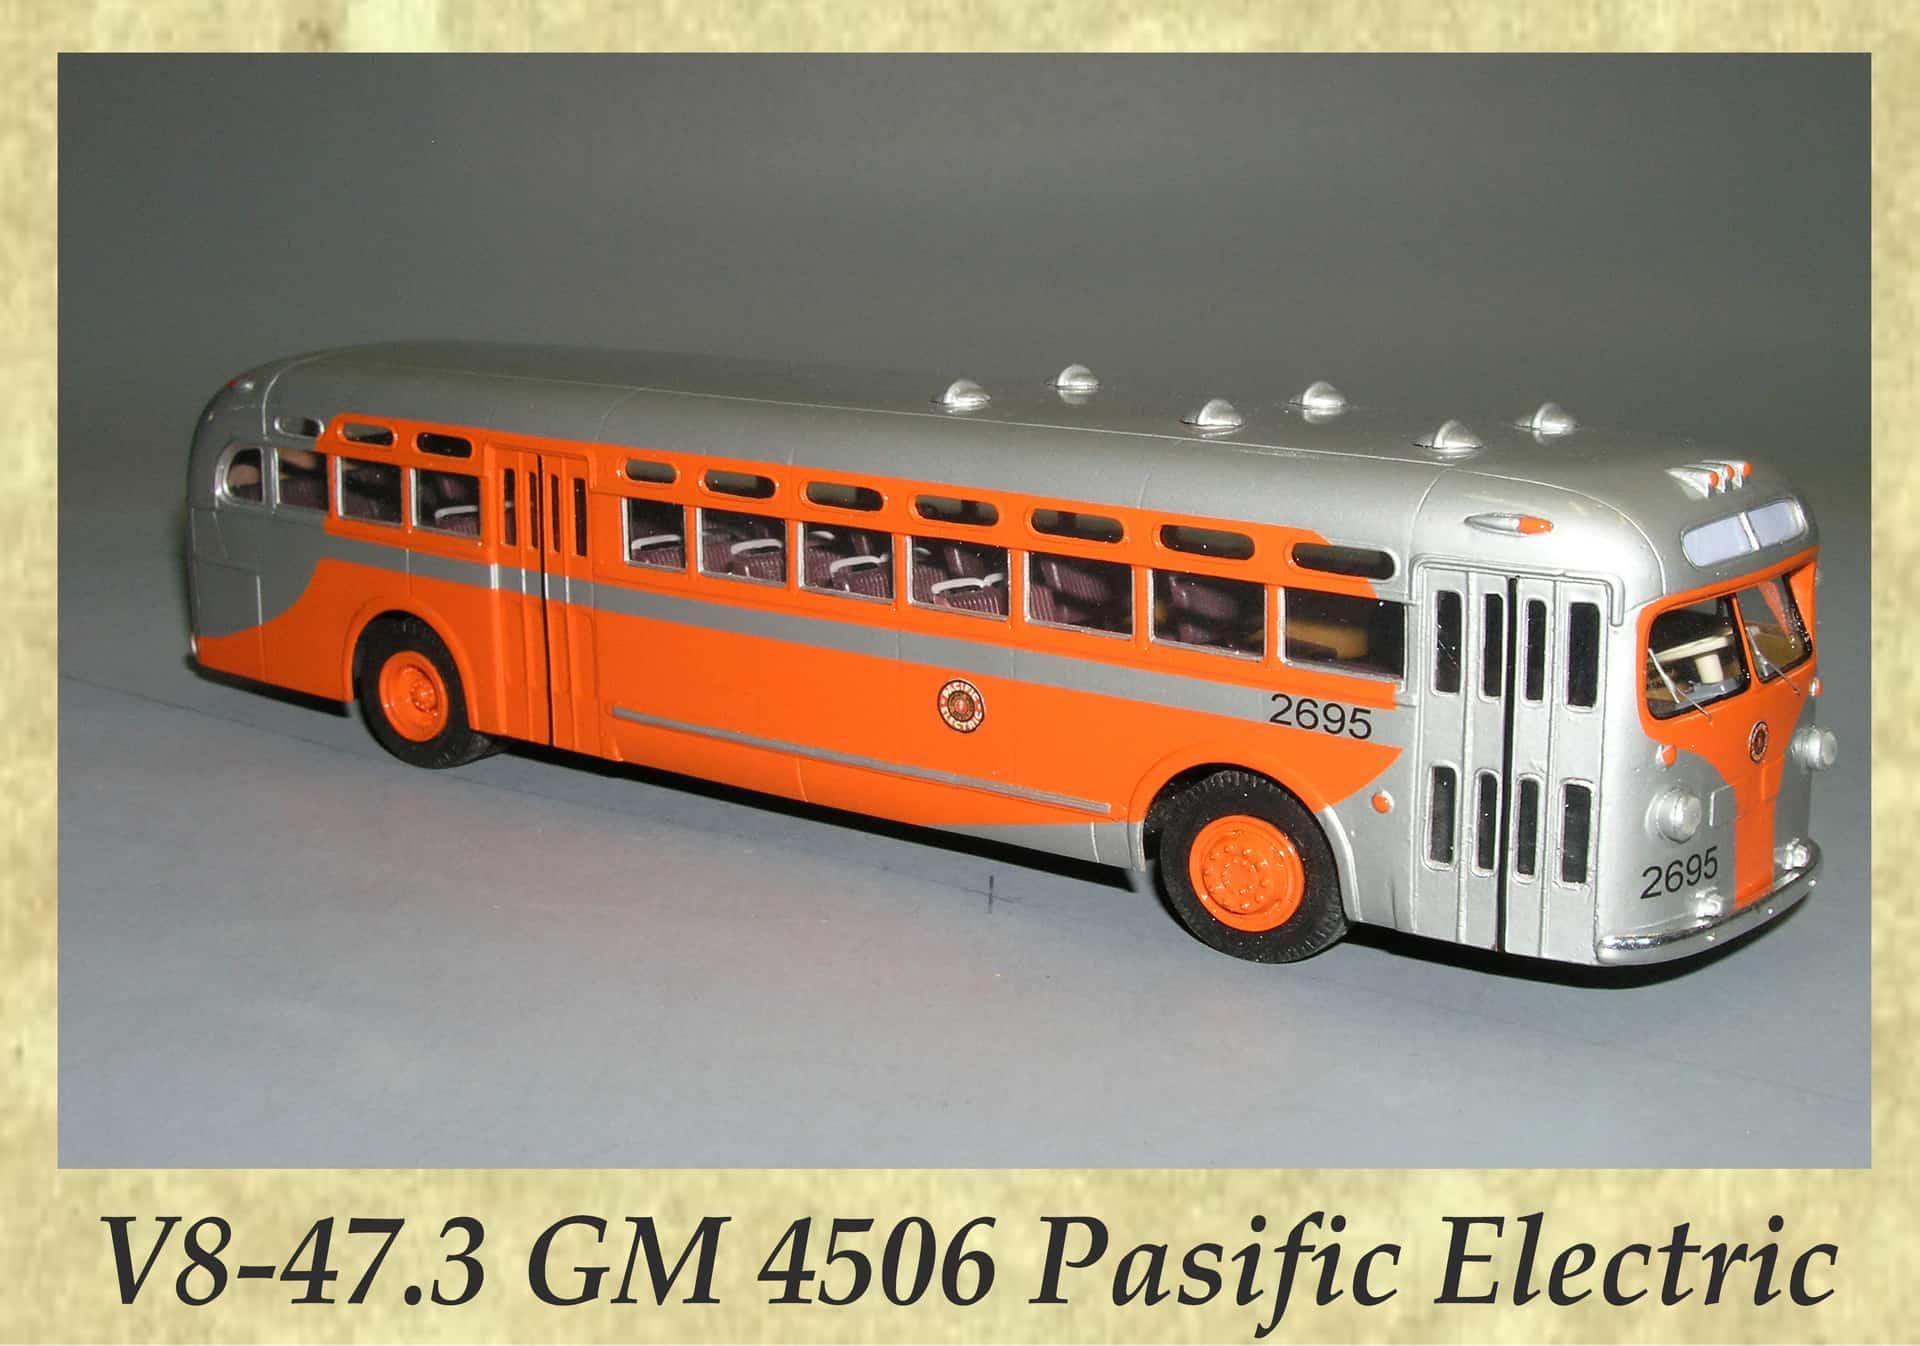 V8-47.3 GM 4506 Pasific Electric